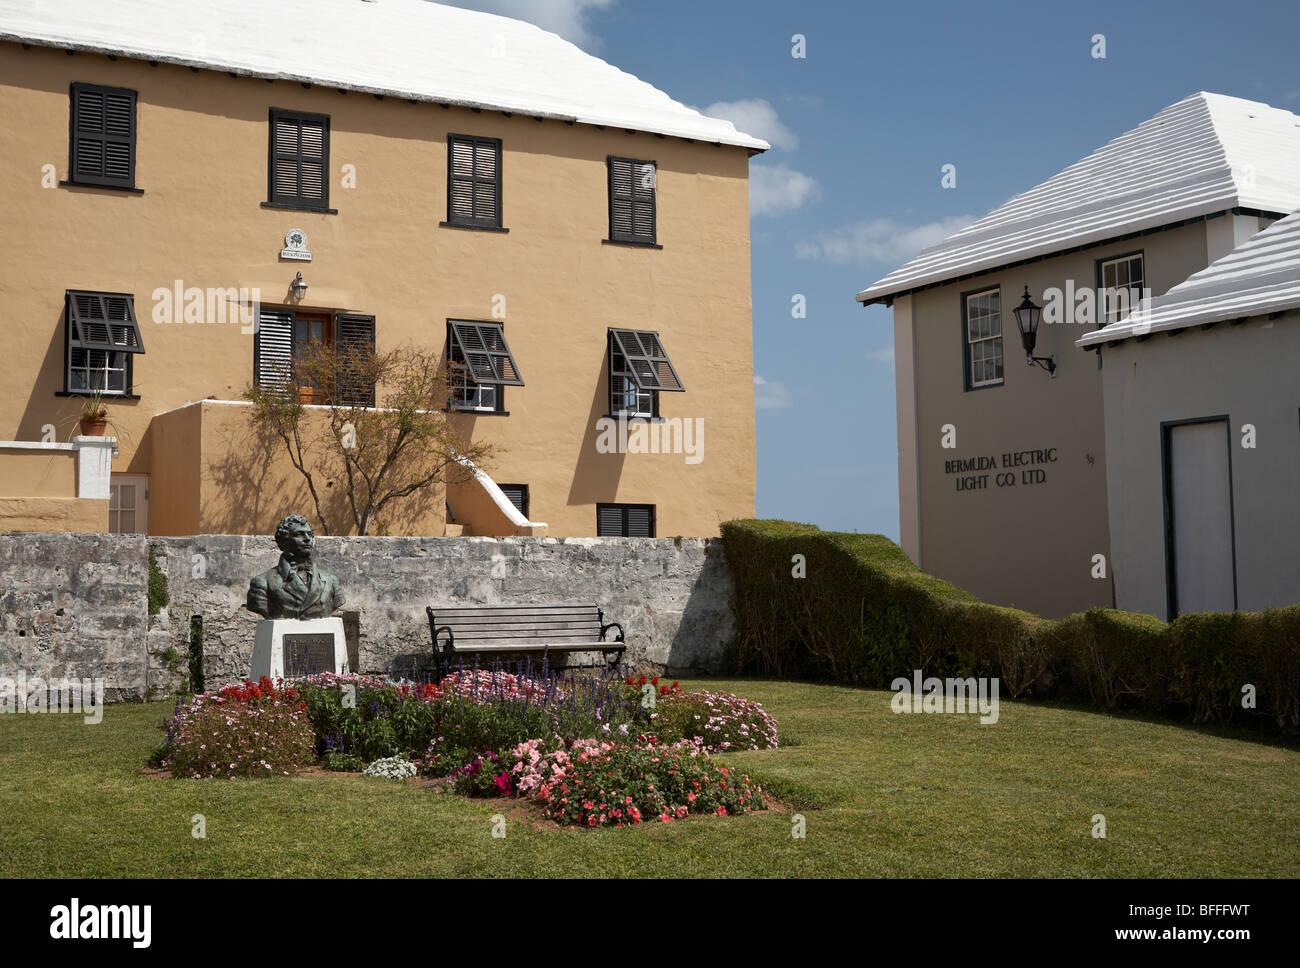 Town of St George, Bermuda - Stock Image